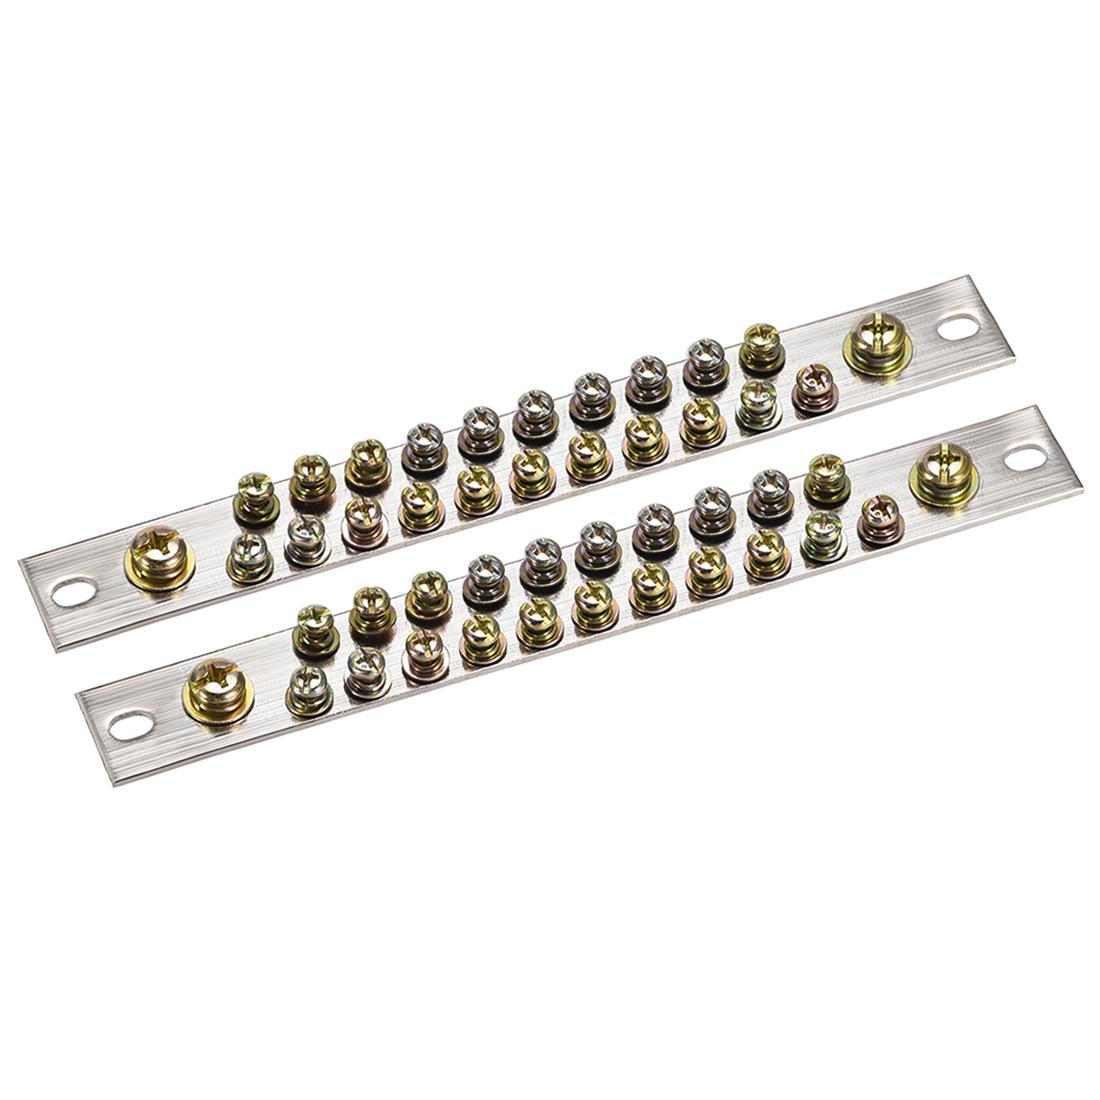 Copper Screw Terminal Block Connector Bar 100A Double Row 23 Positions 2 Pcs